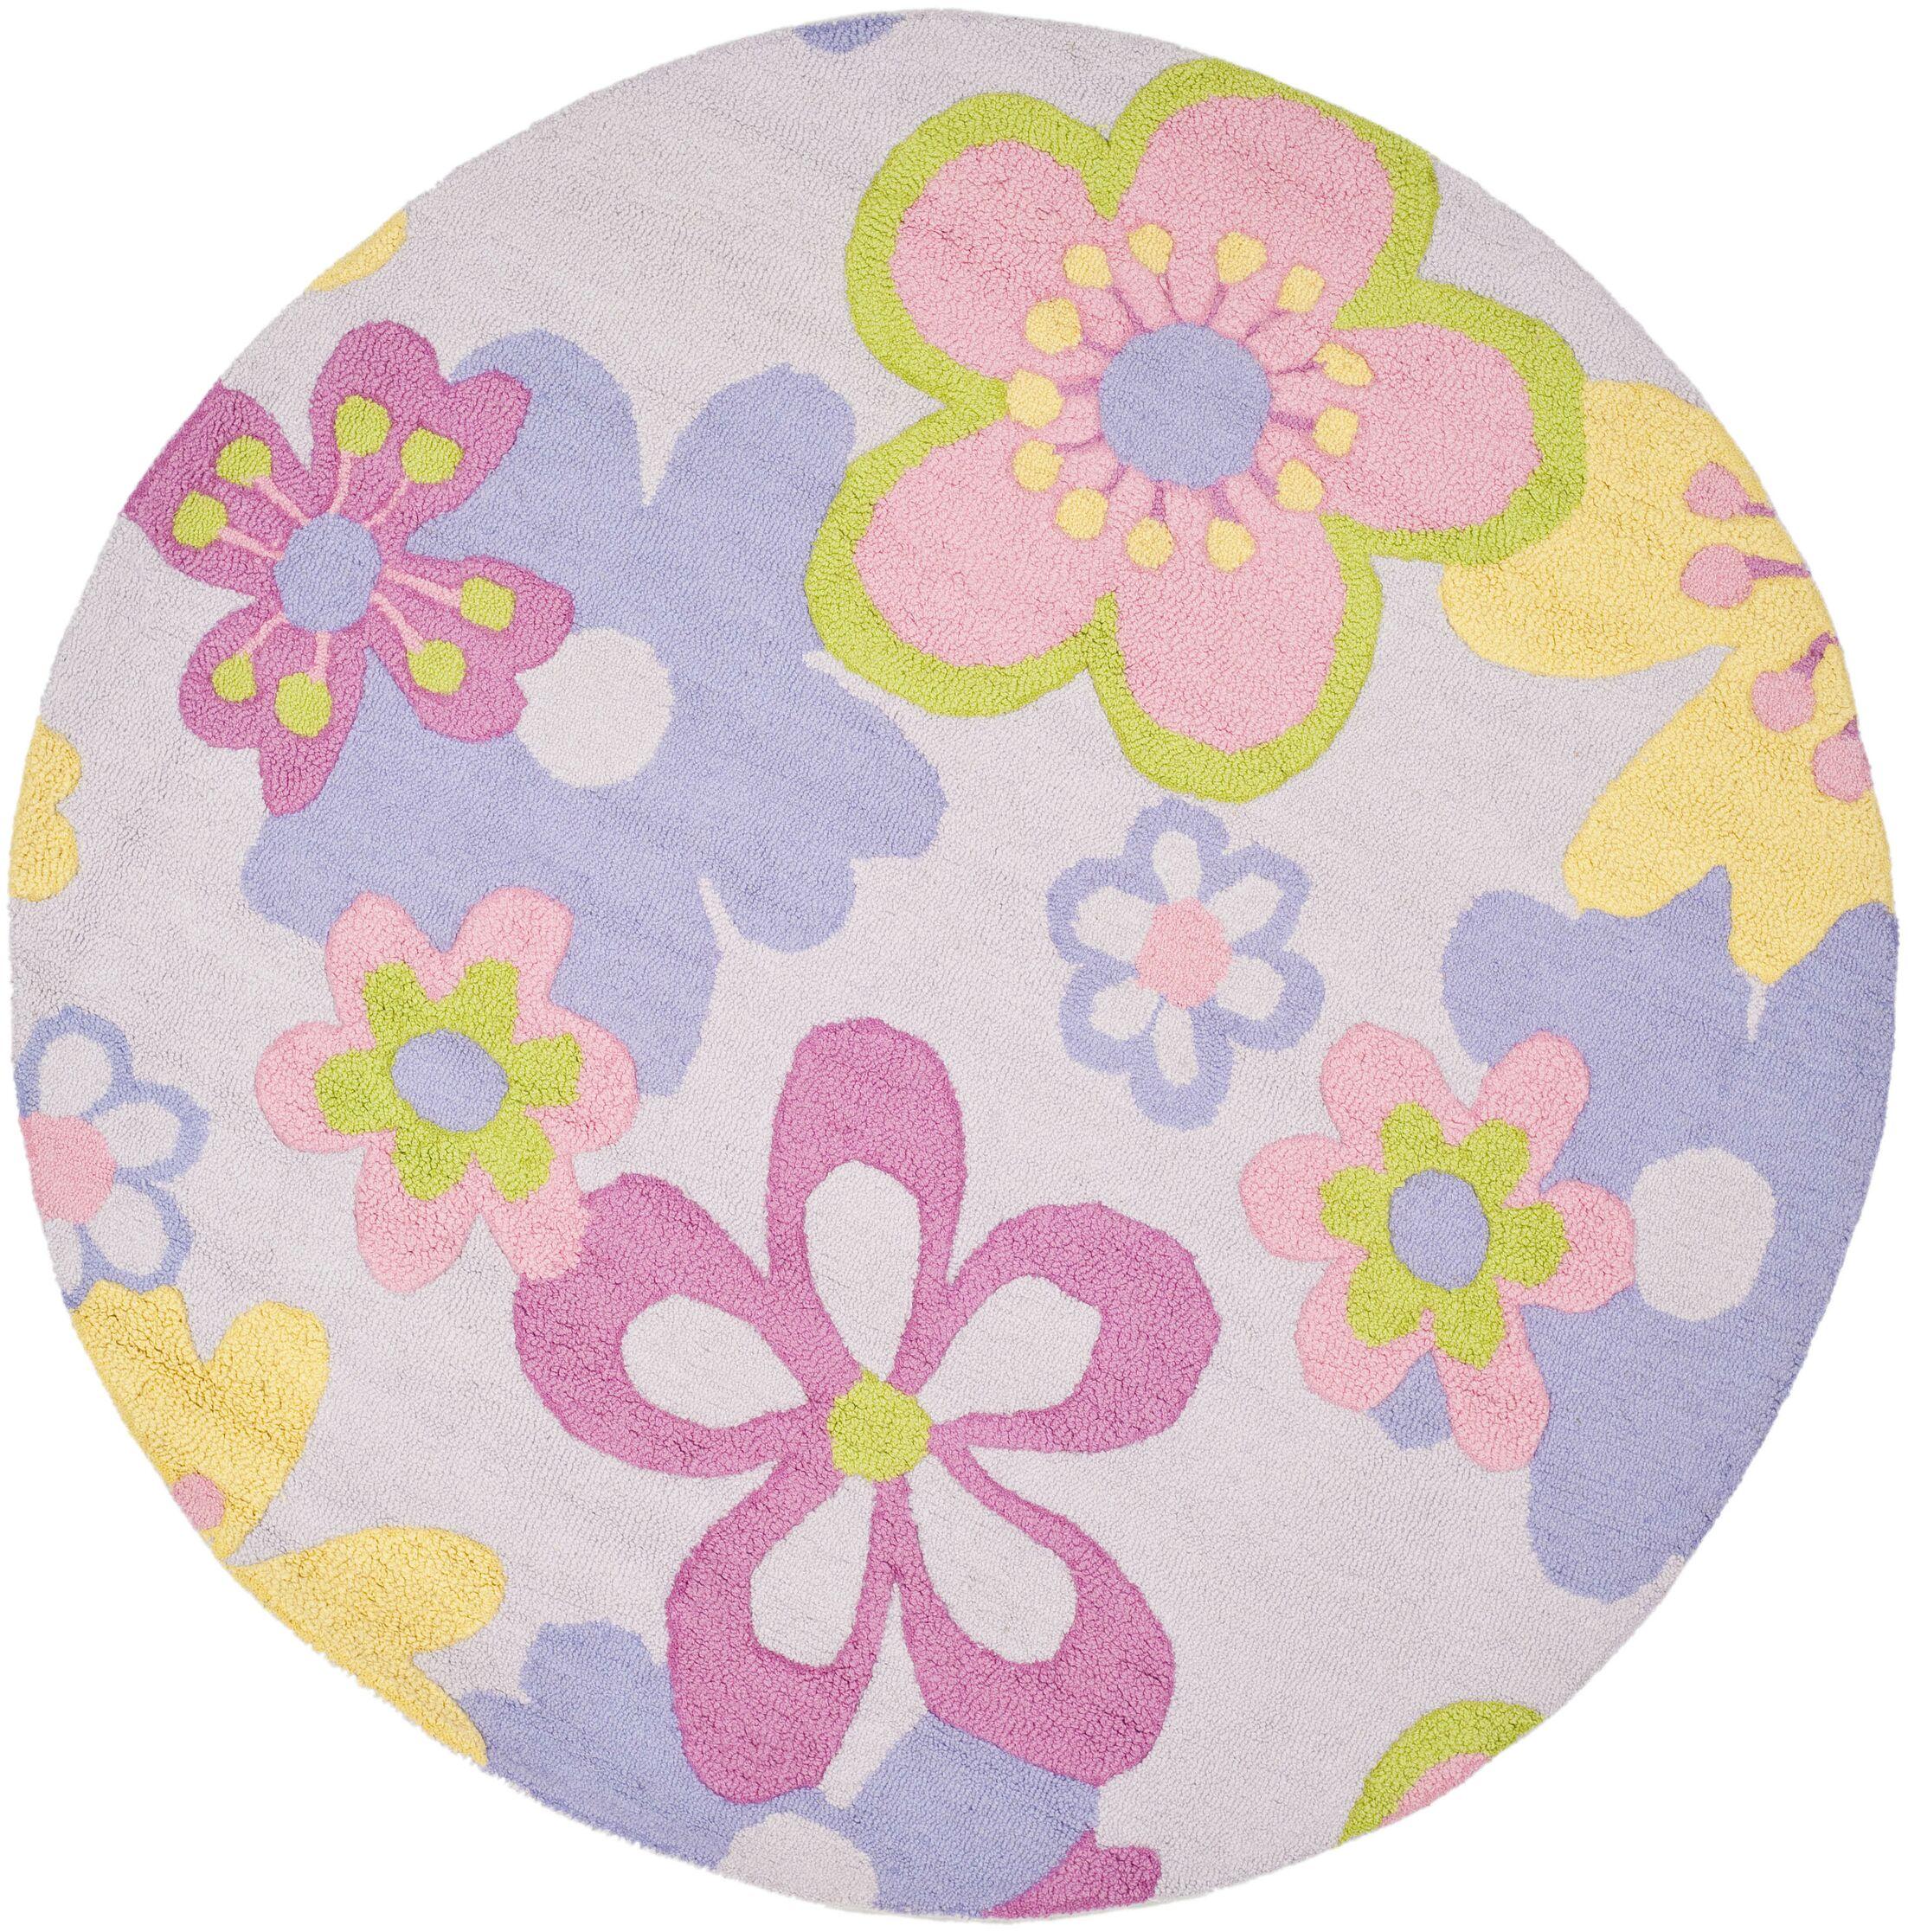 LeVar Hand-Tufted Pink/Purple Area Rug Rug Size: Round 4'